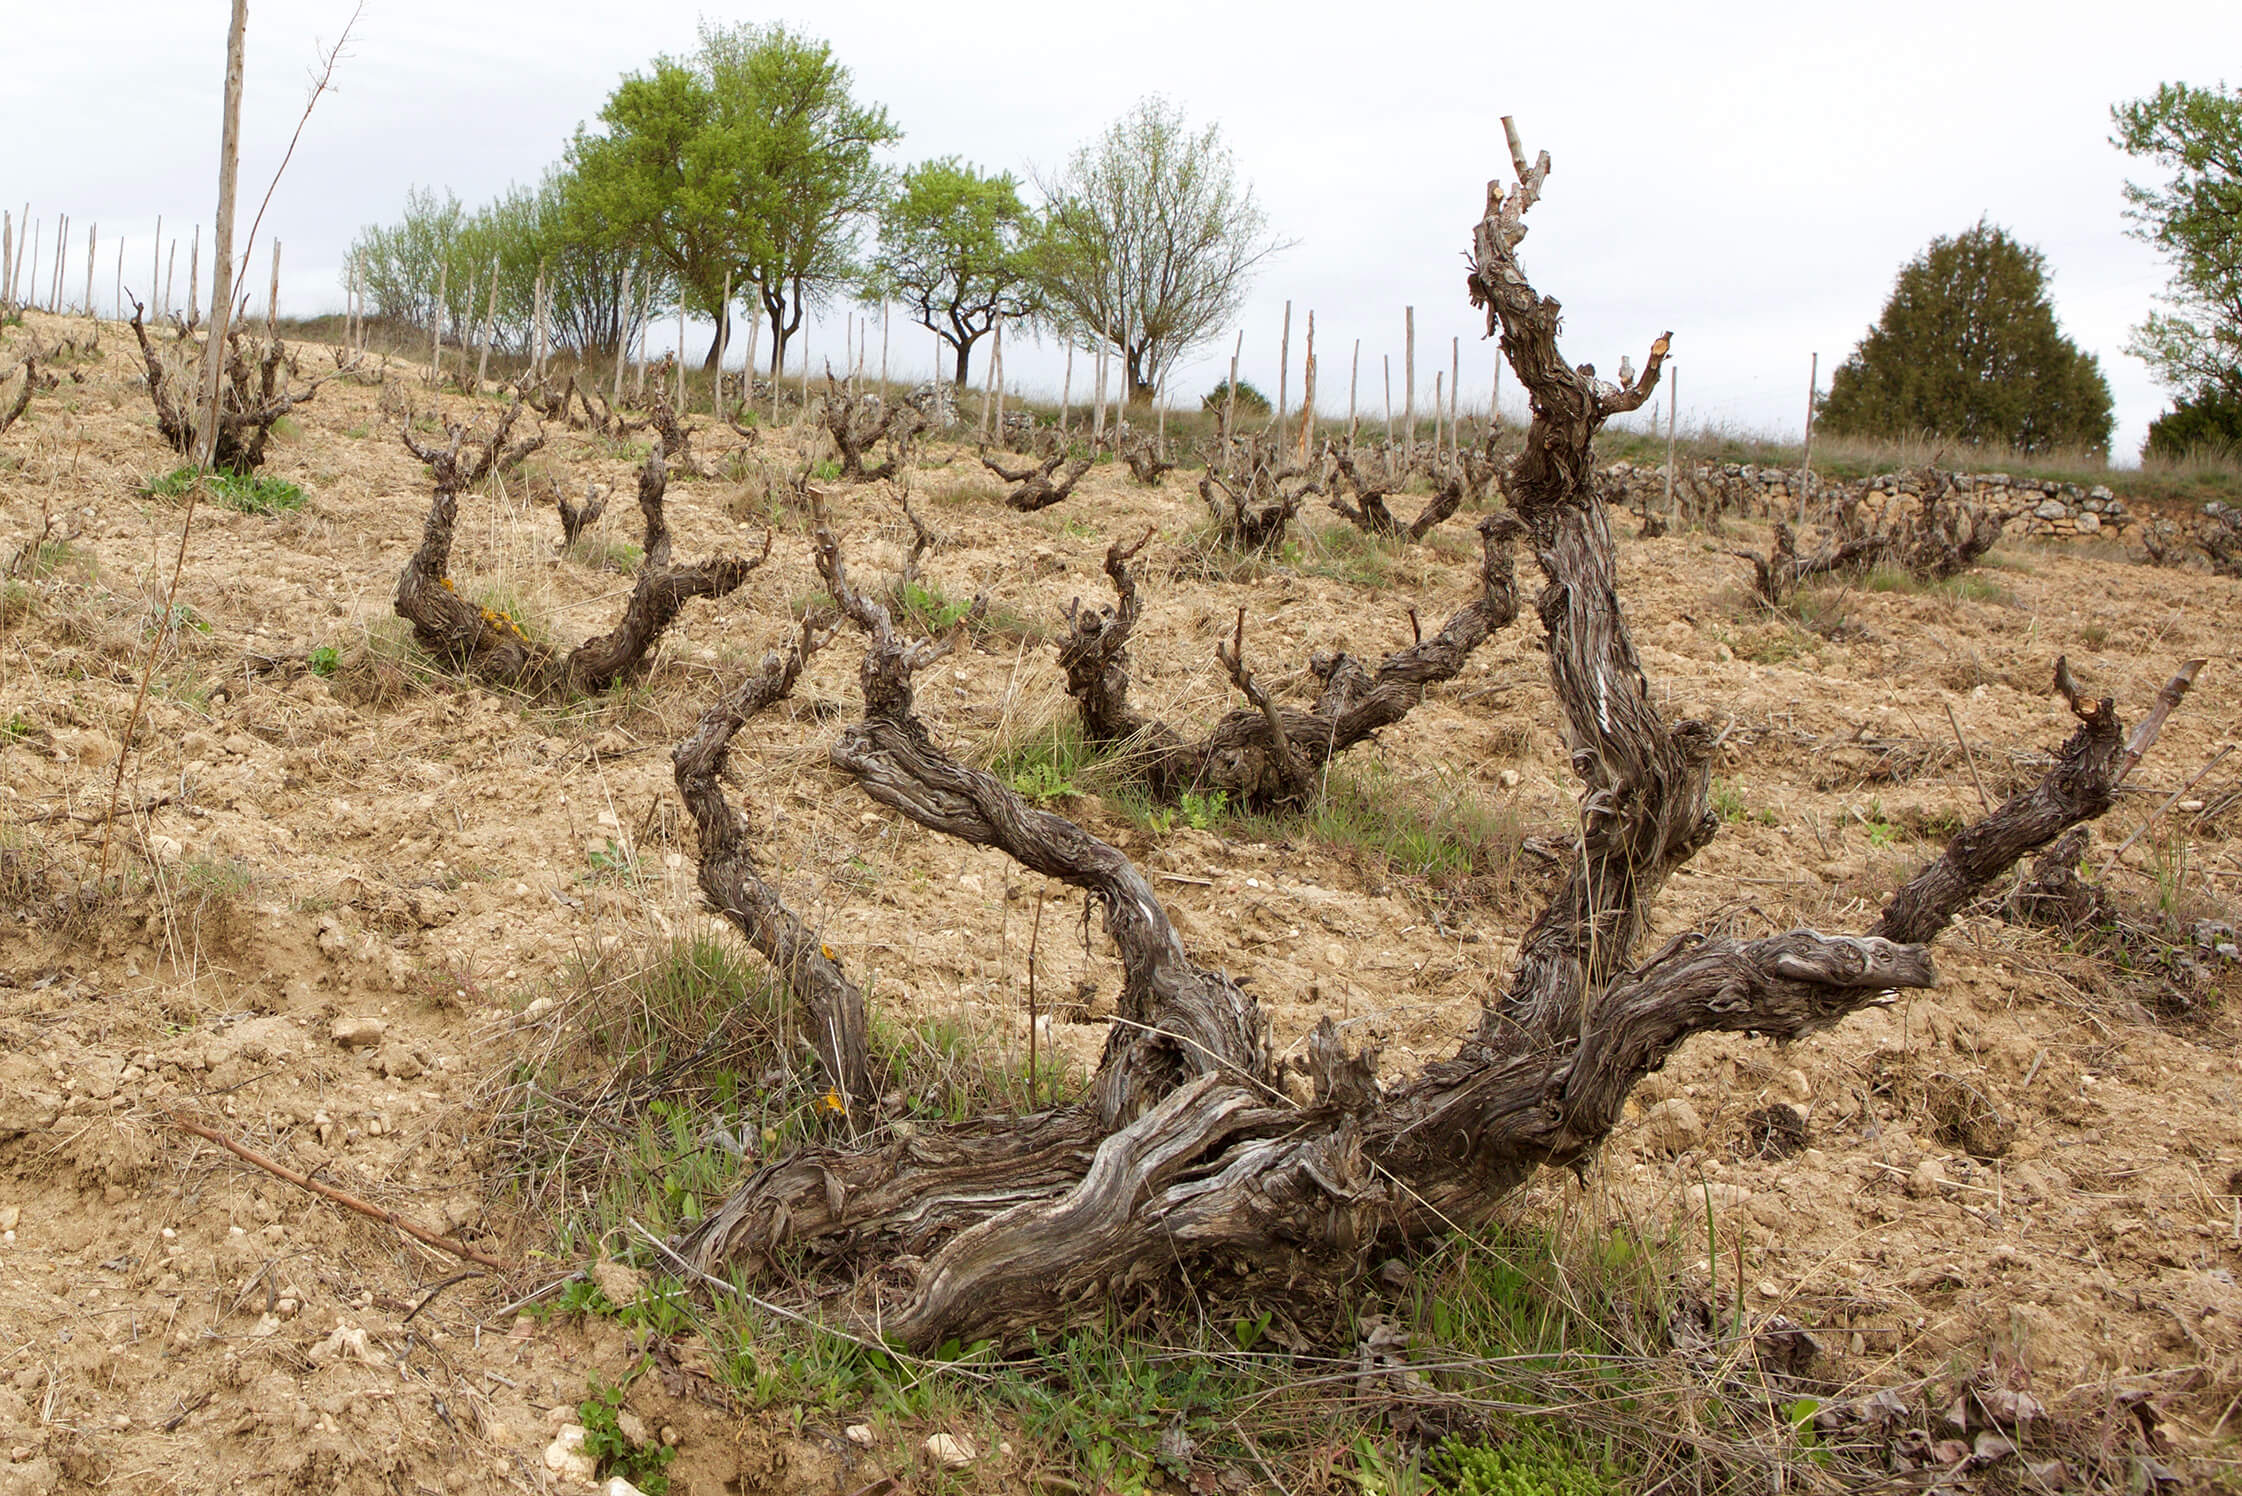 Pre-phylloxera vines in the Carremolino vineyard of César Fernández